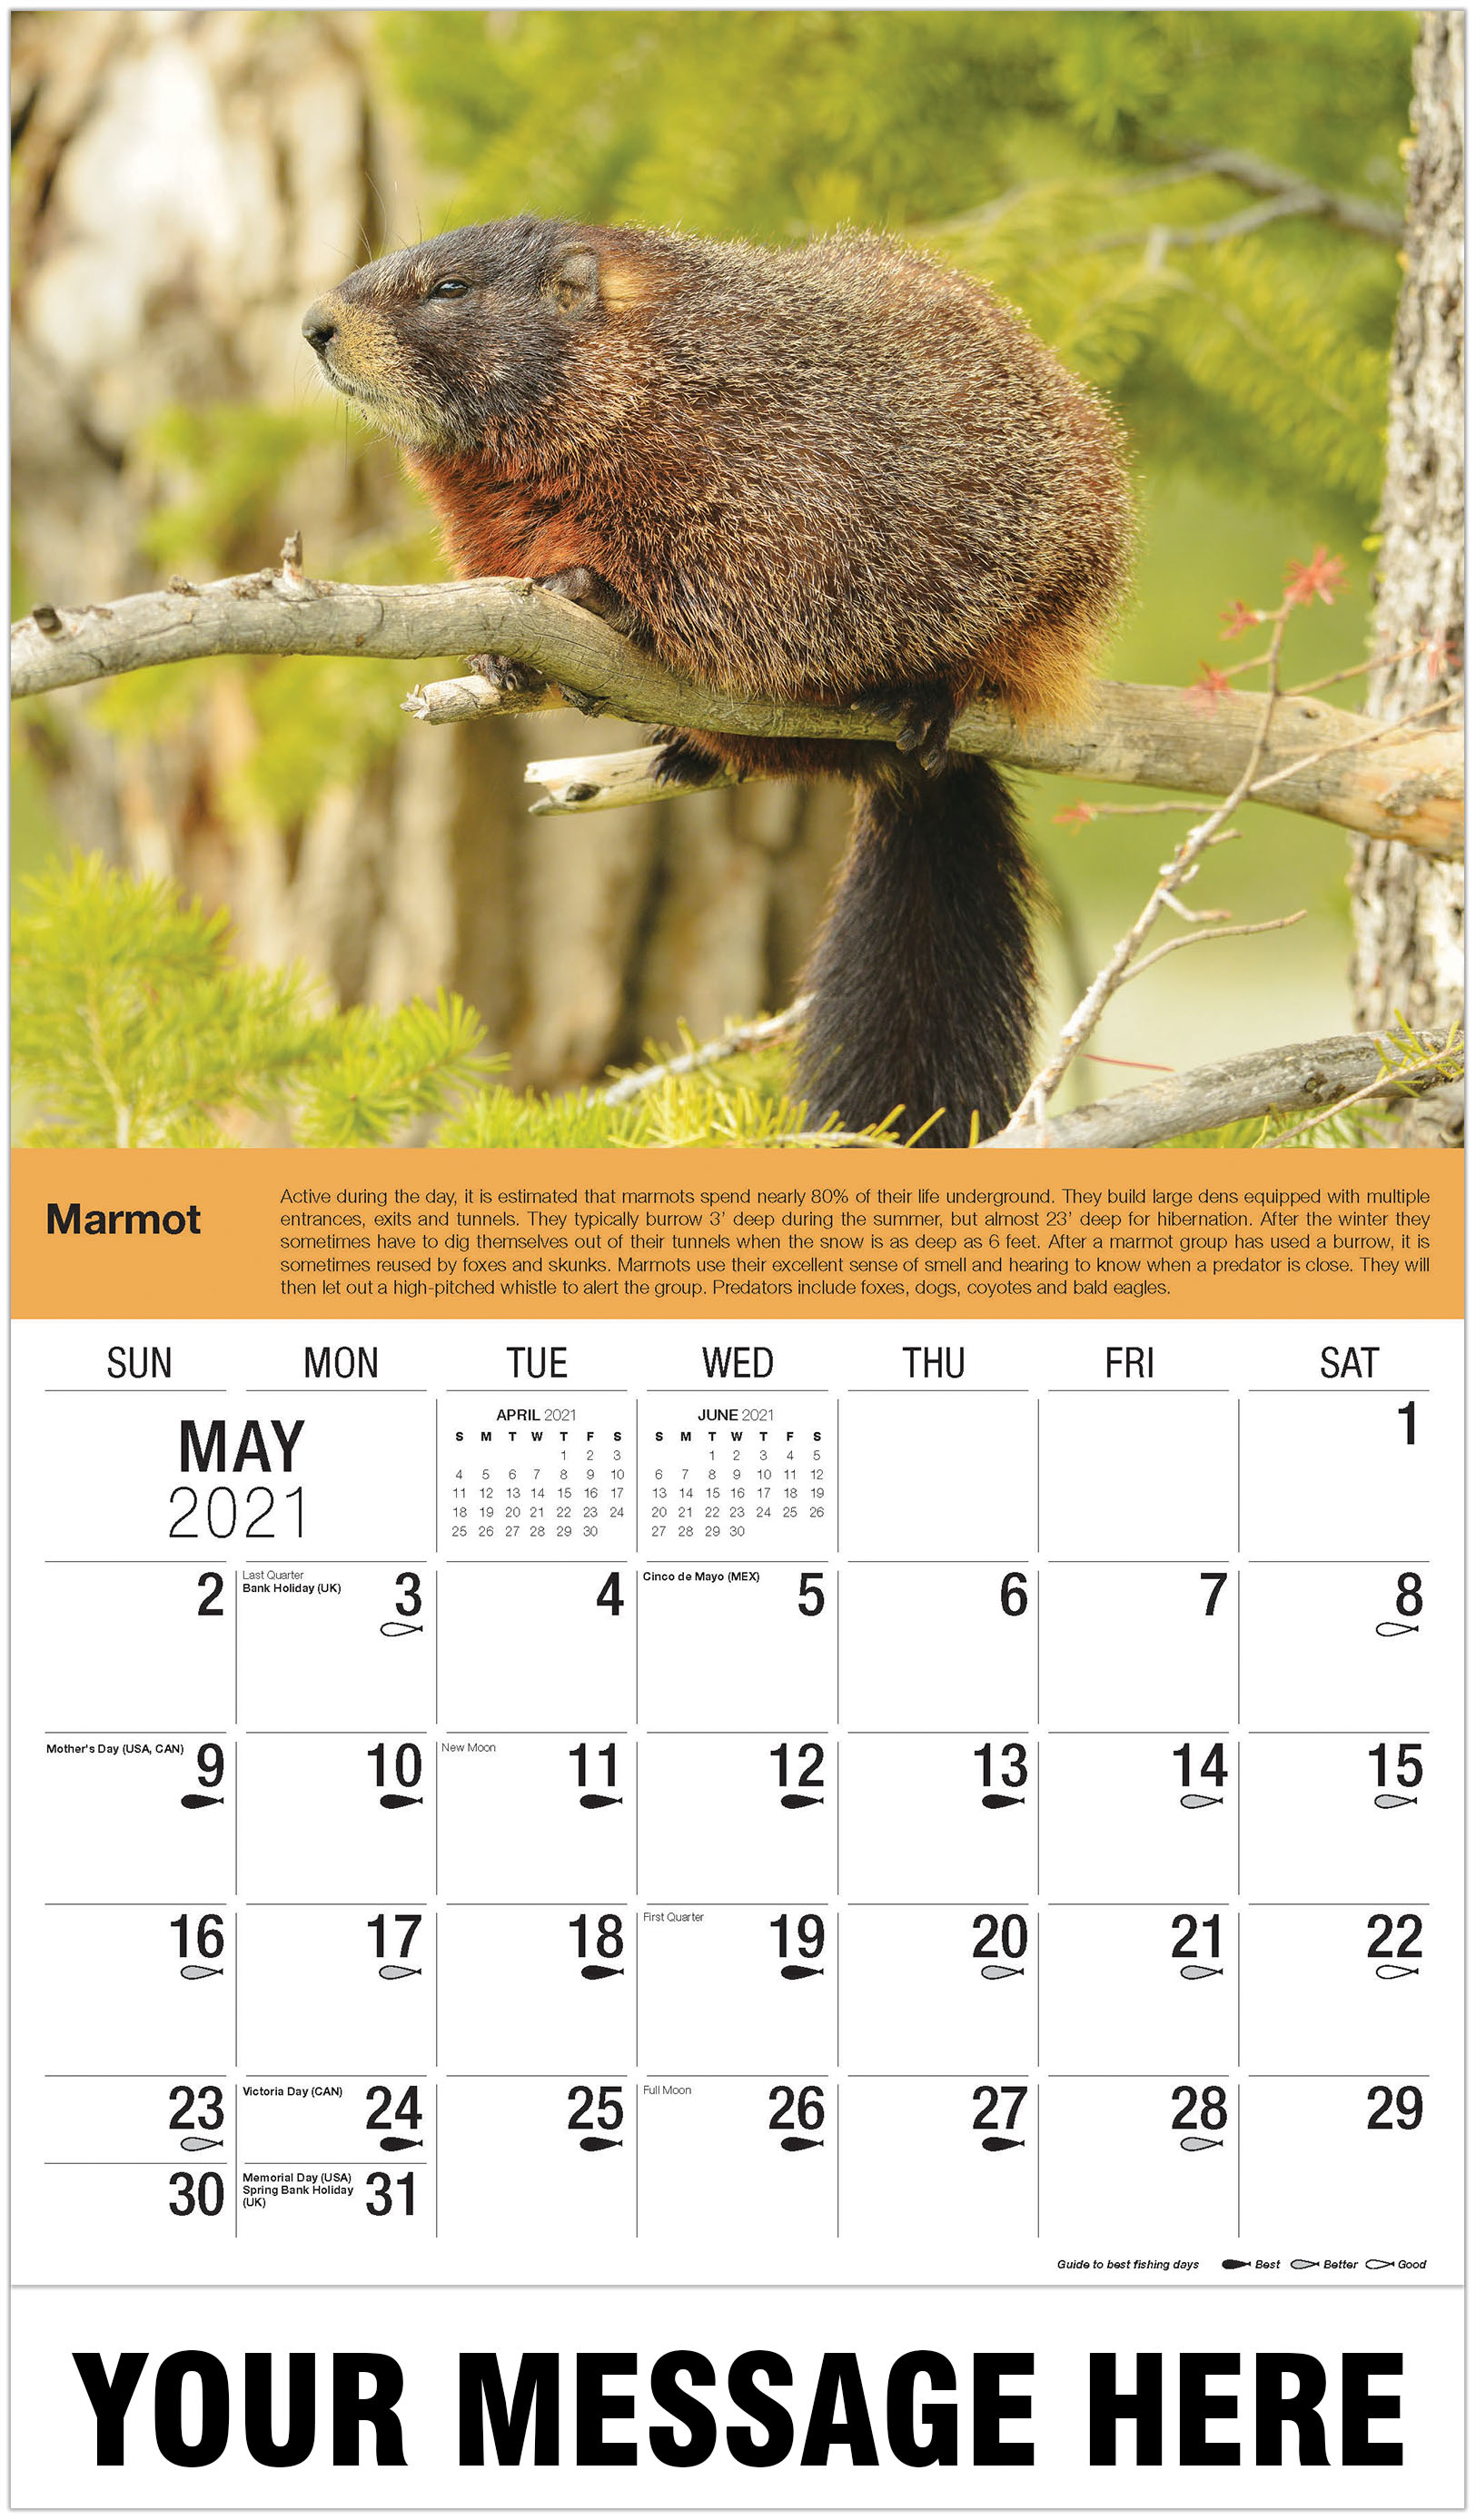 Marmot - May - North American Wildlife 2021 Promotional Calendar